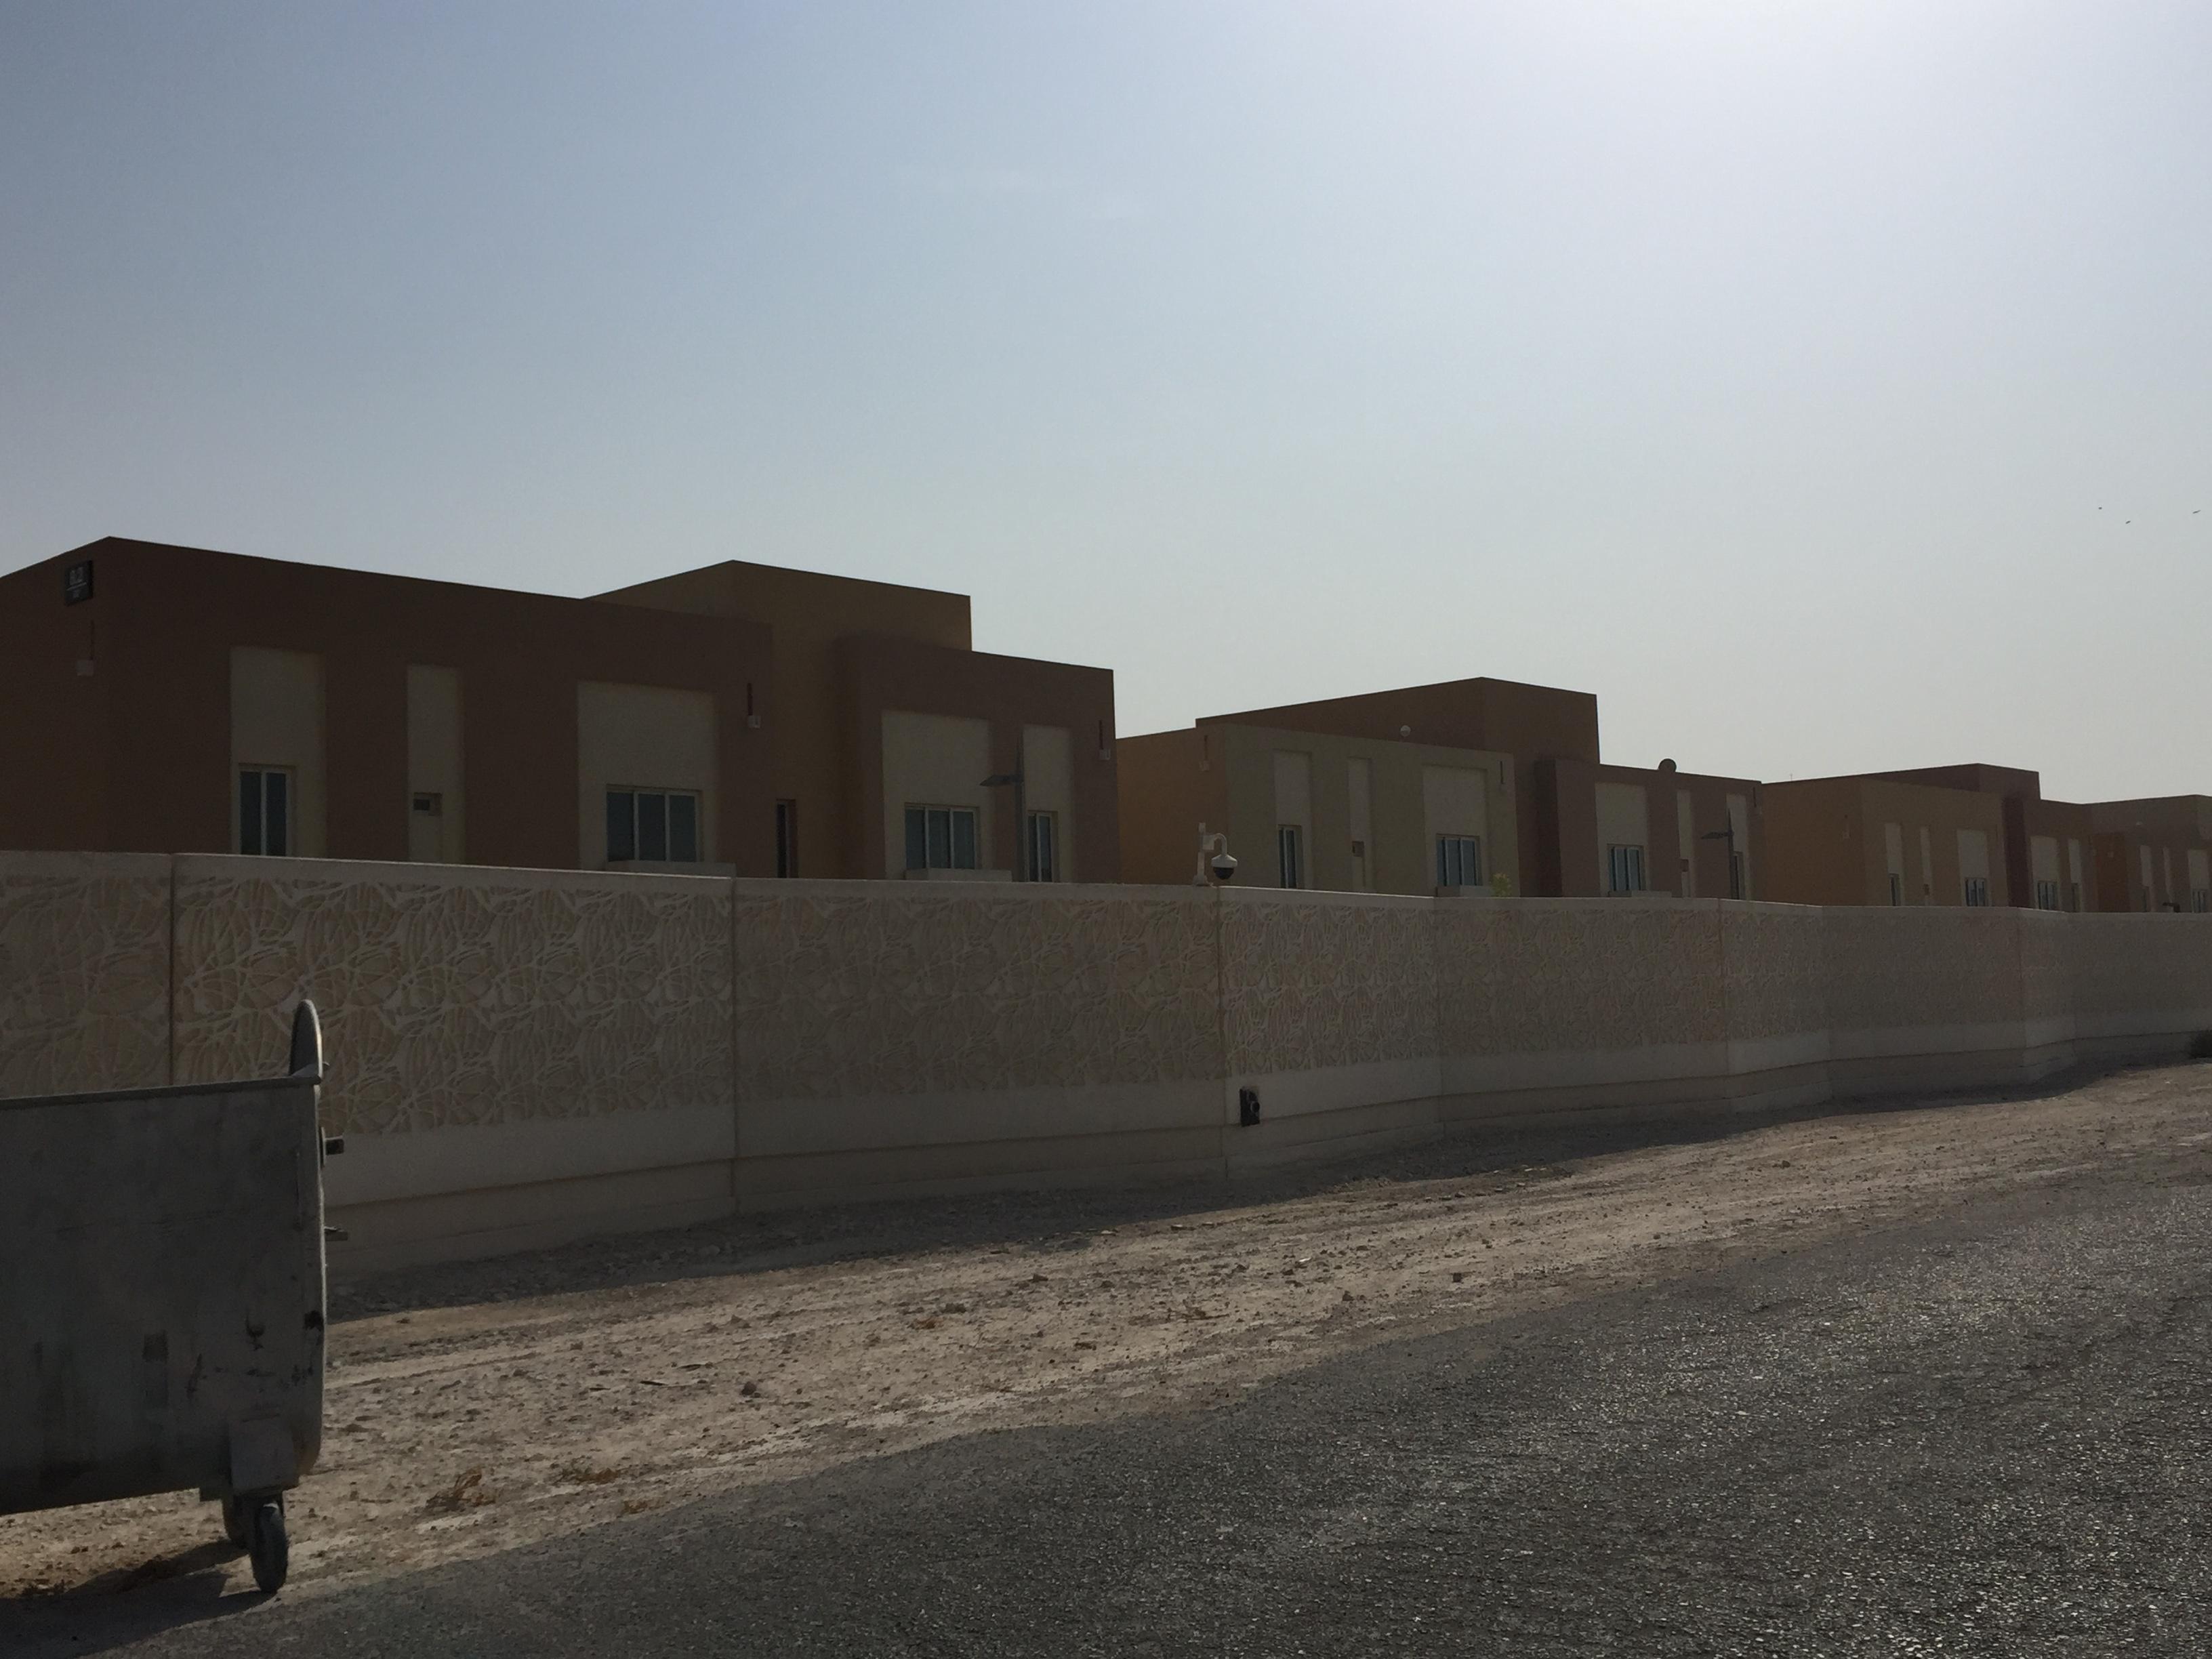 Sidra hospital compounds - Page 4 - British Expats